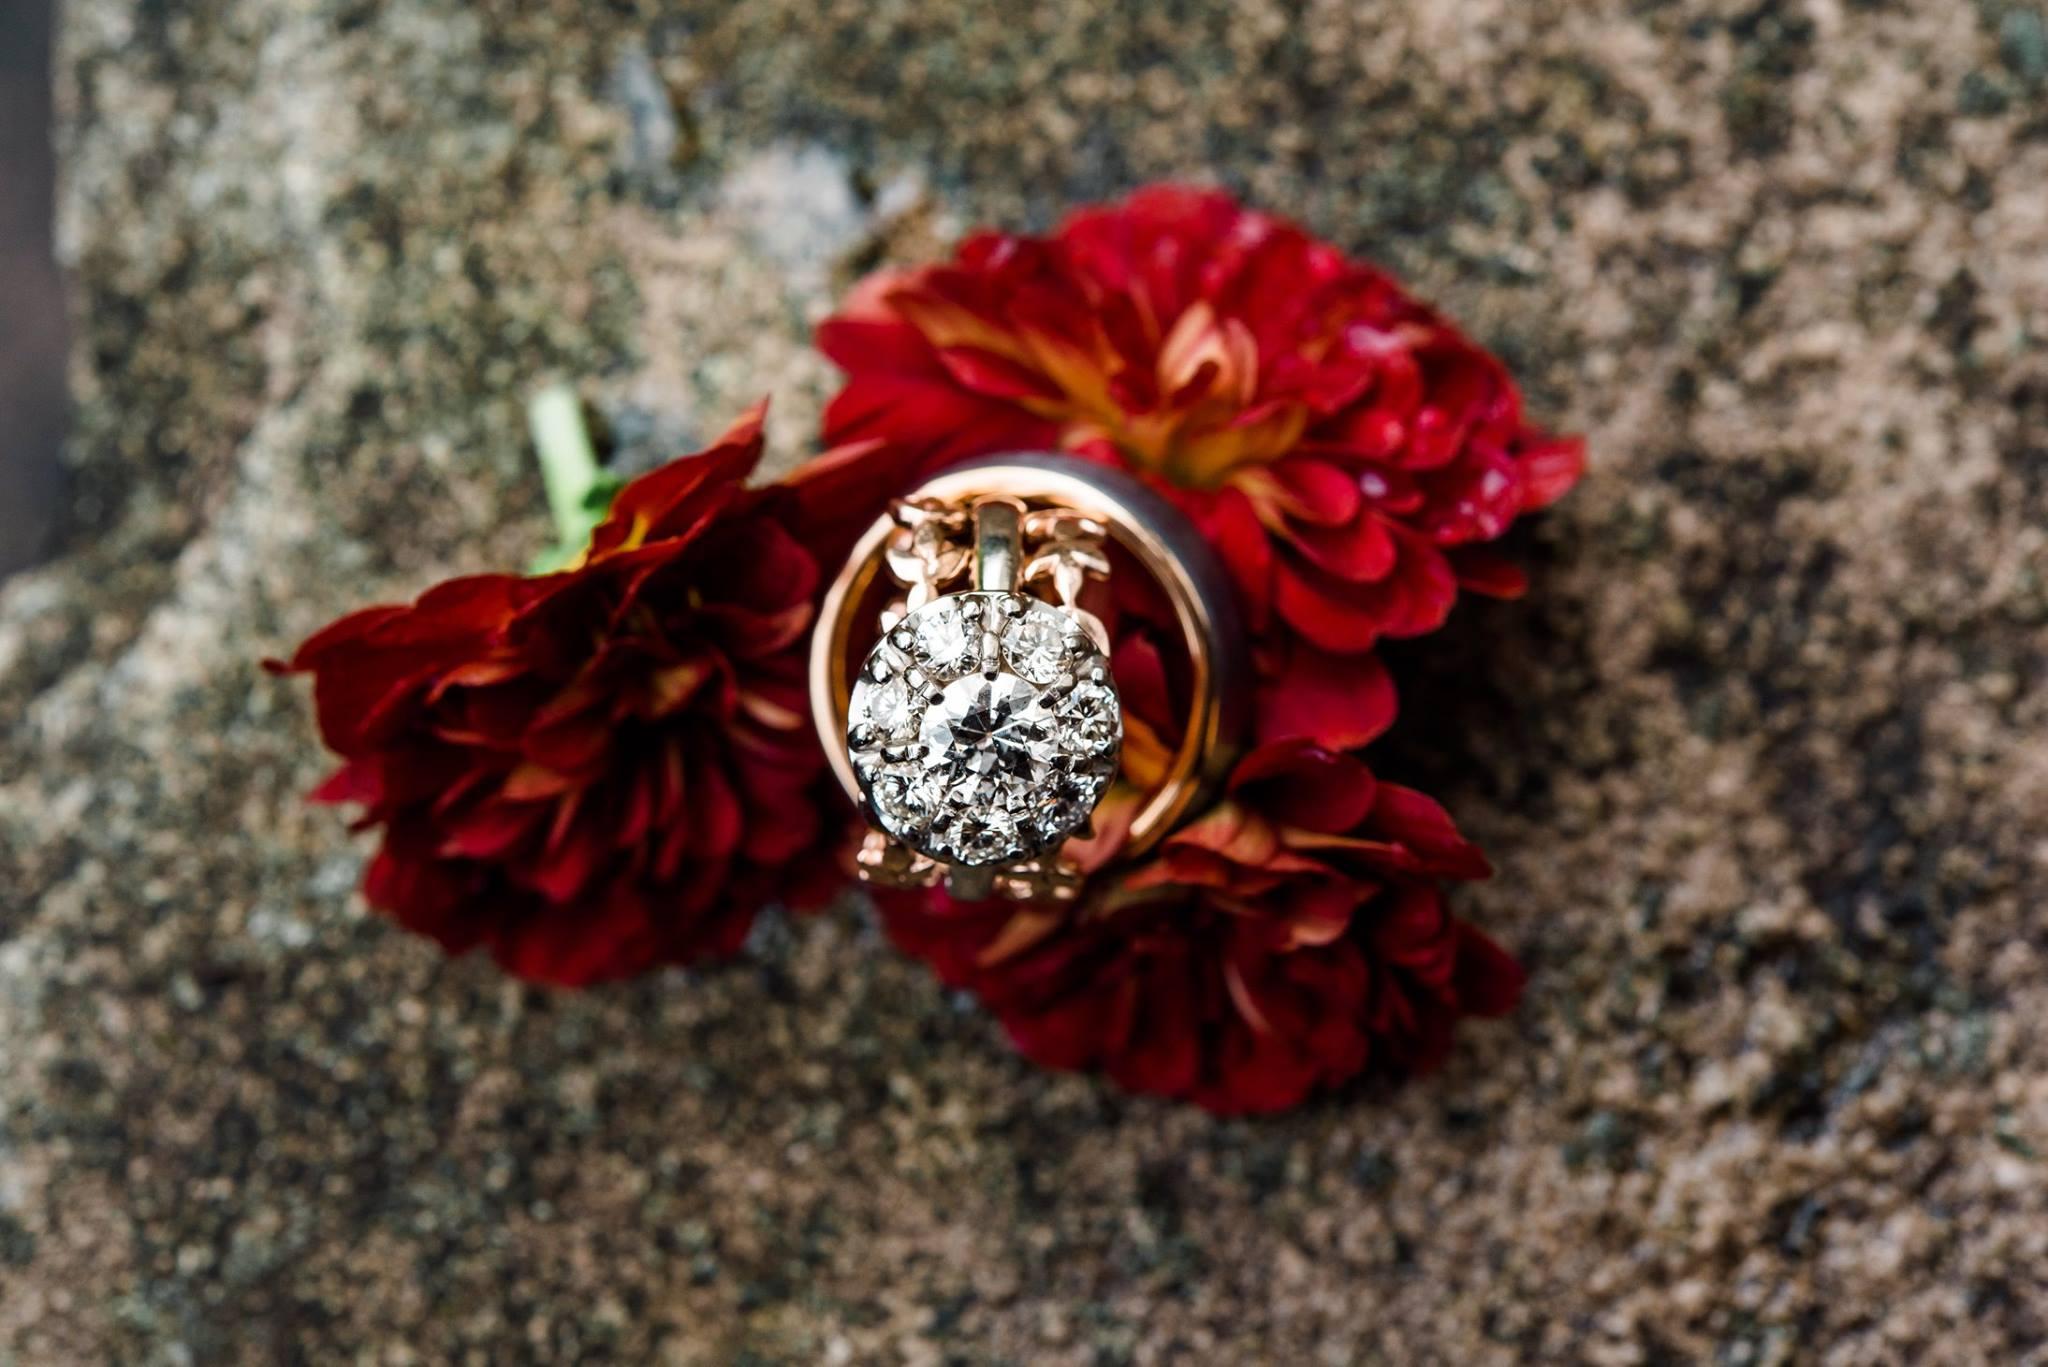 pennsylvania-backyard-wedding-love-diy-bohemian-romantic-colorful-0003.jpg